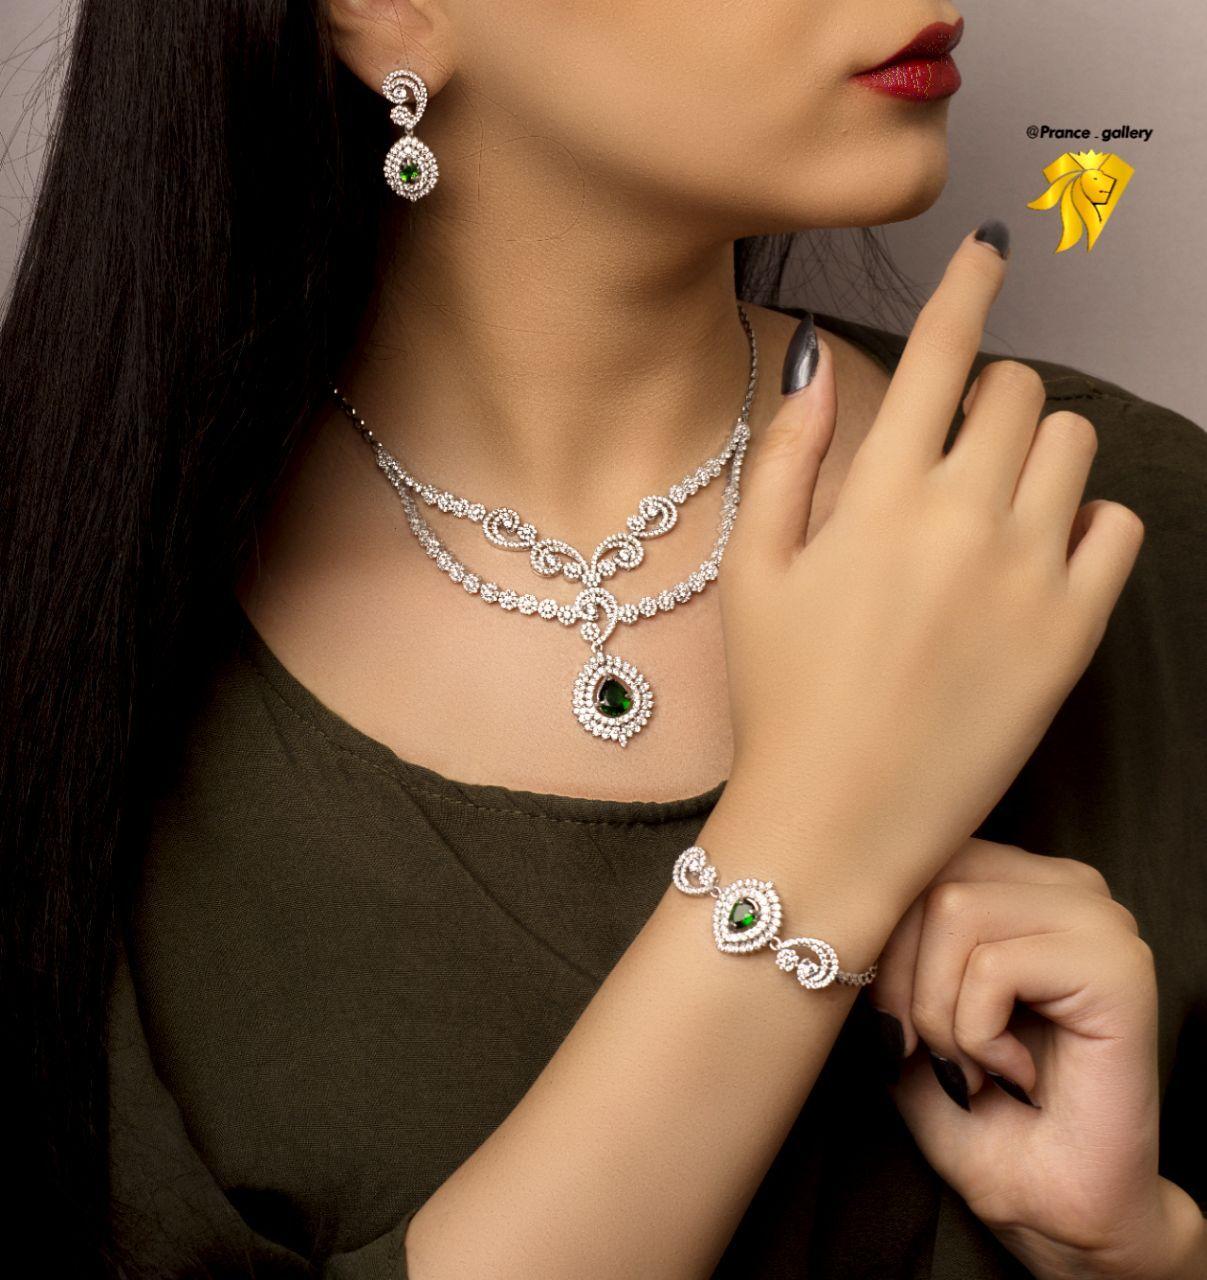 سرویس جواهری زمرد نقره روکش طلا